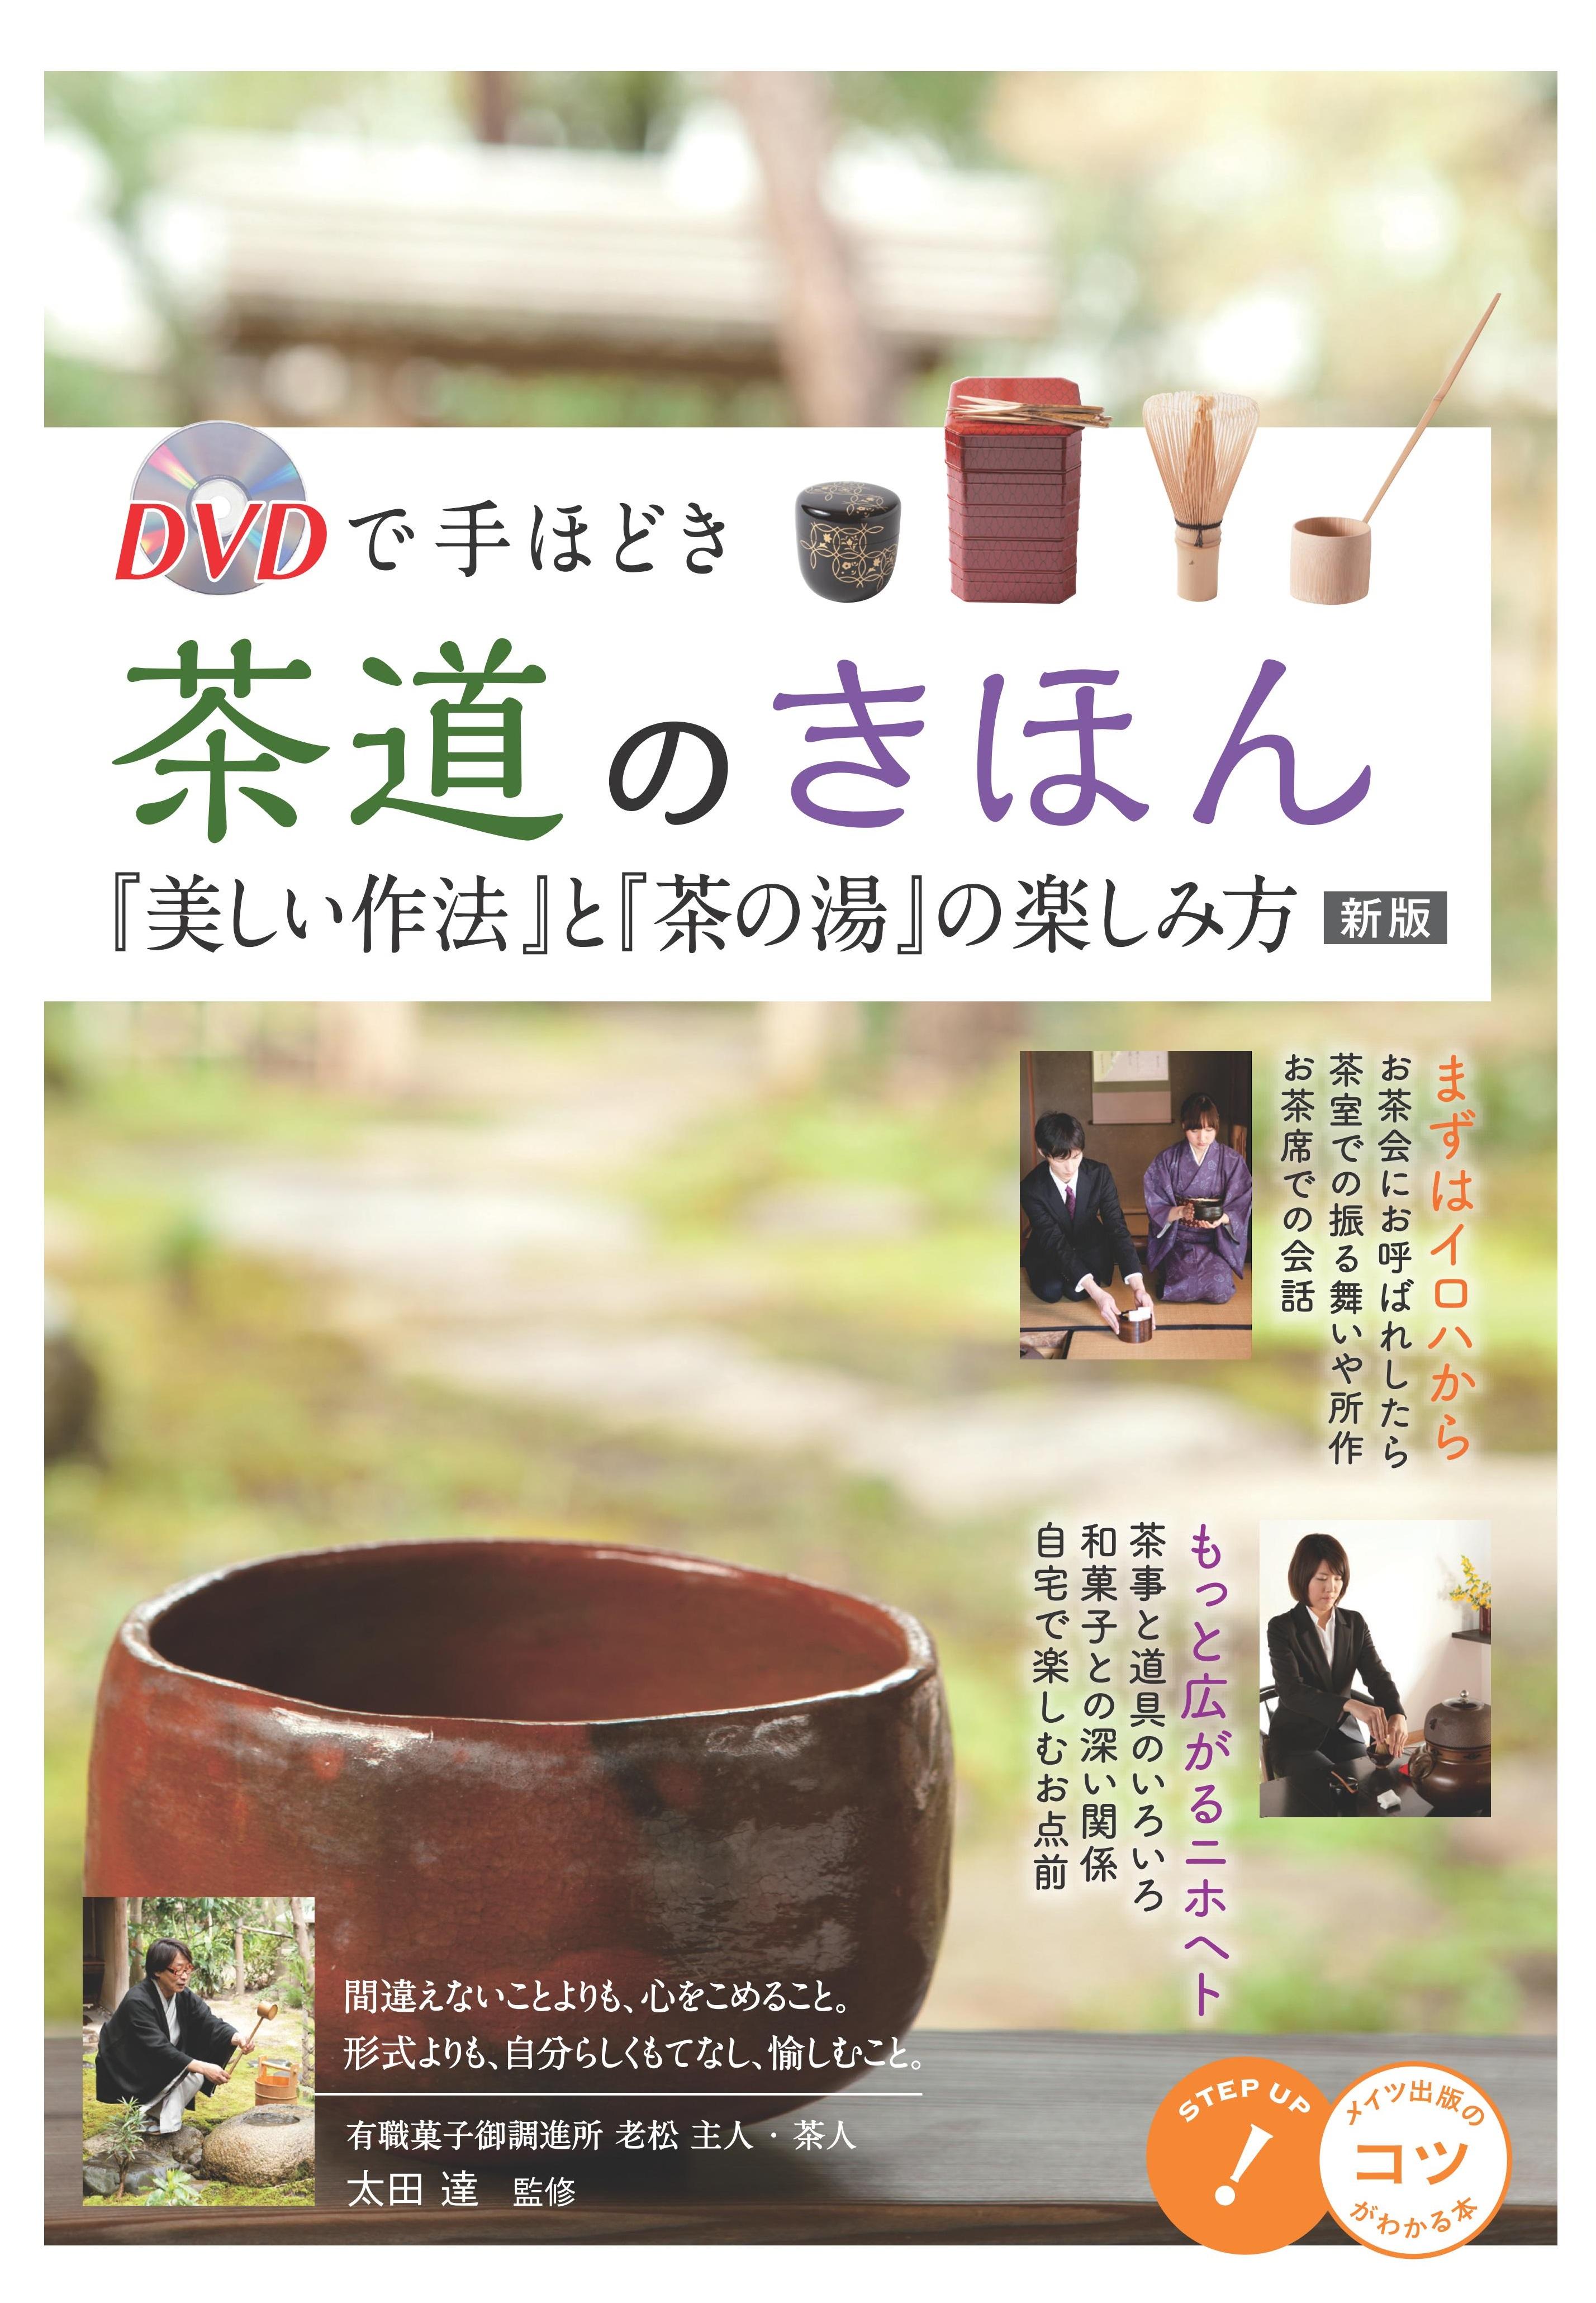 DVDで手ほどき 茶道のきほん 「美しい作法」と「茶の湯」の楽しみ方 新版